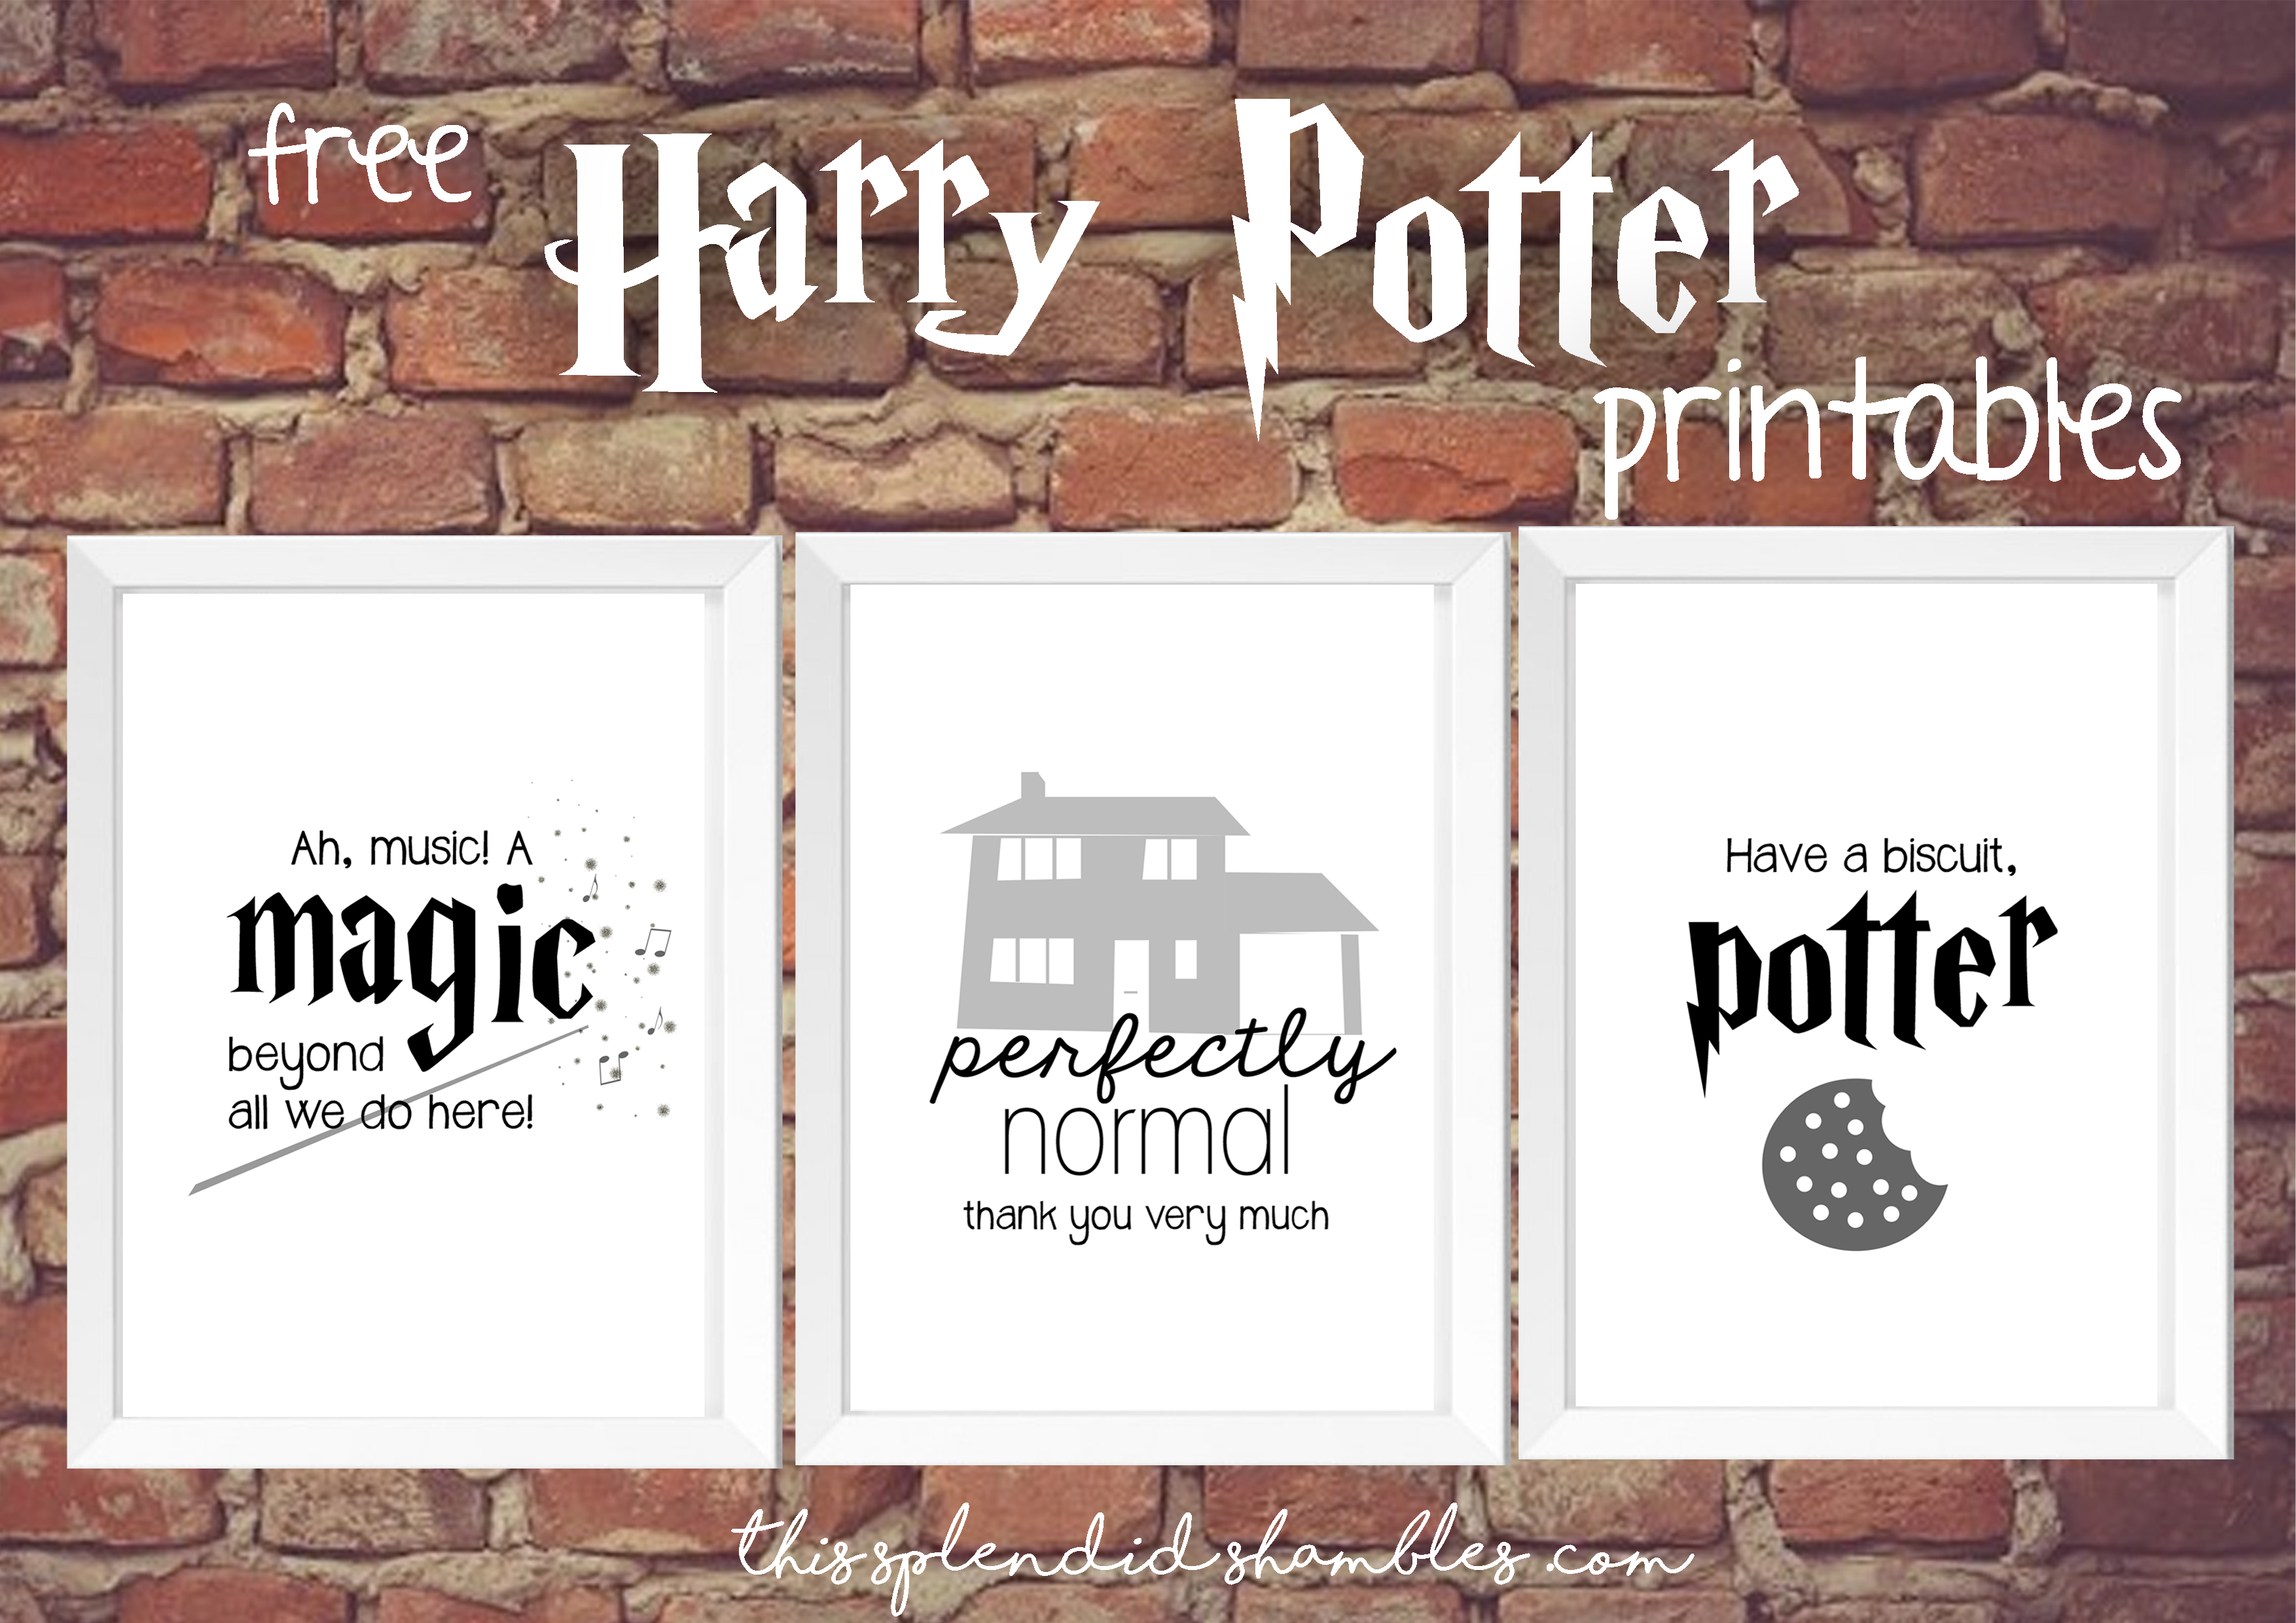 Harry Potter Week - 3 Free Printables - This Splendid Shambles - Free Printable Harry Potter Pictures